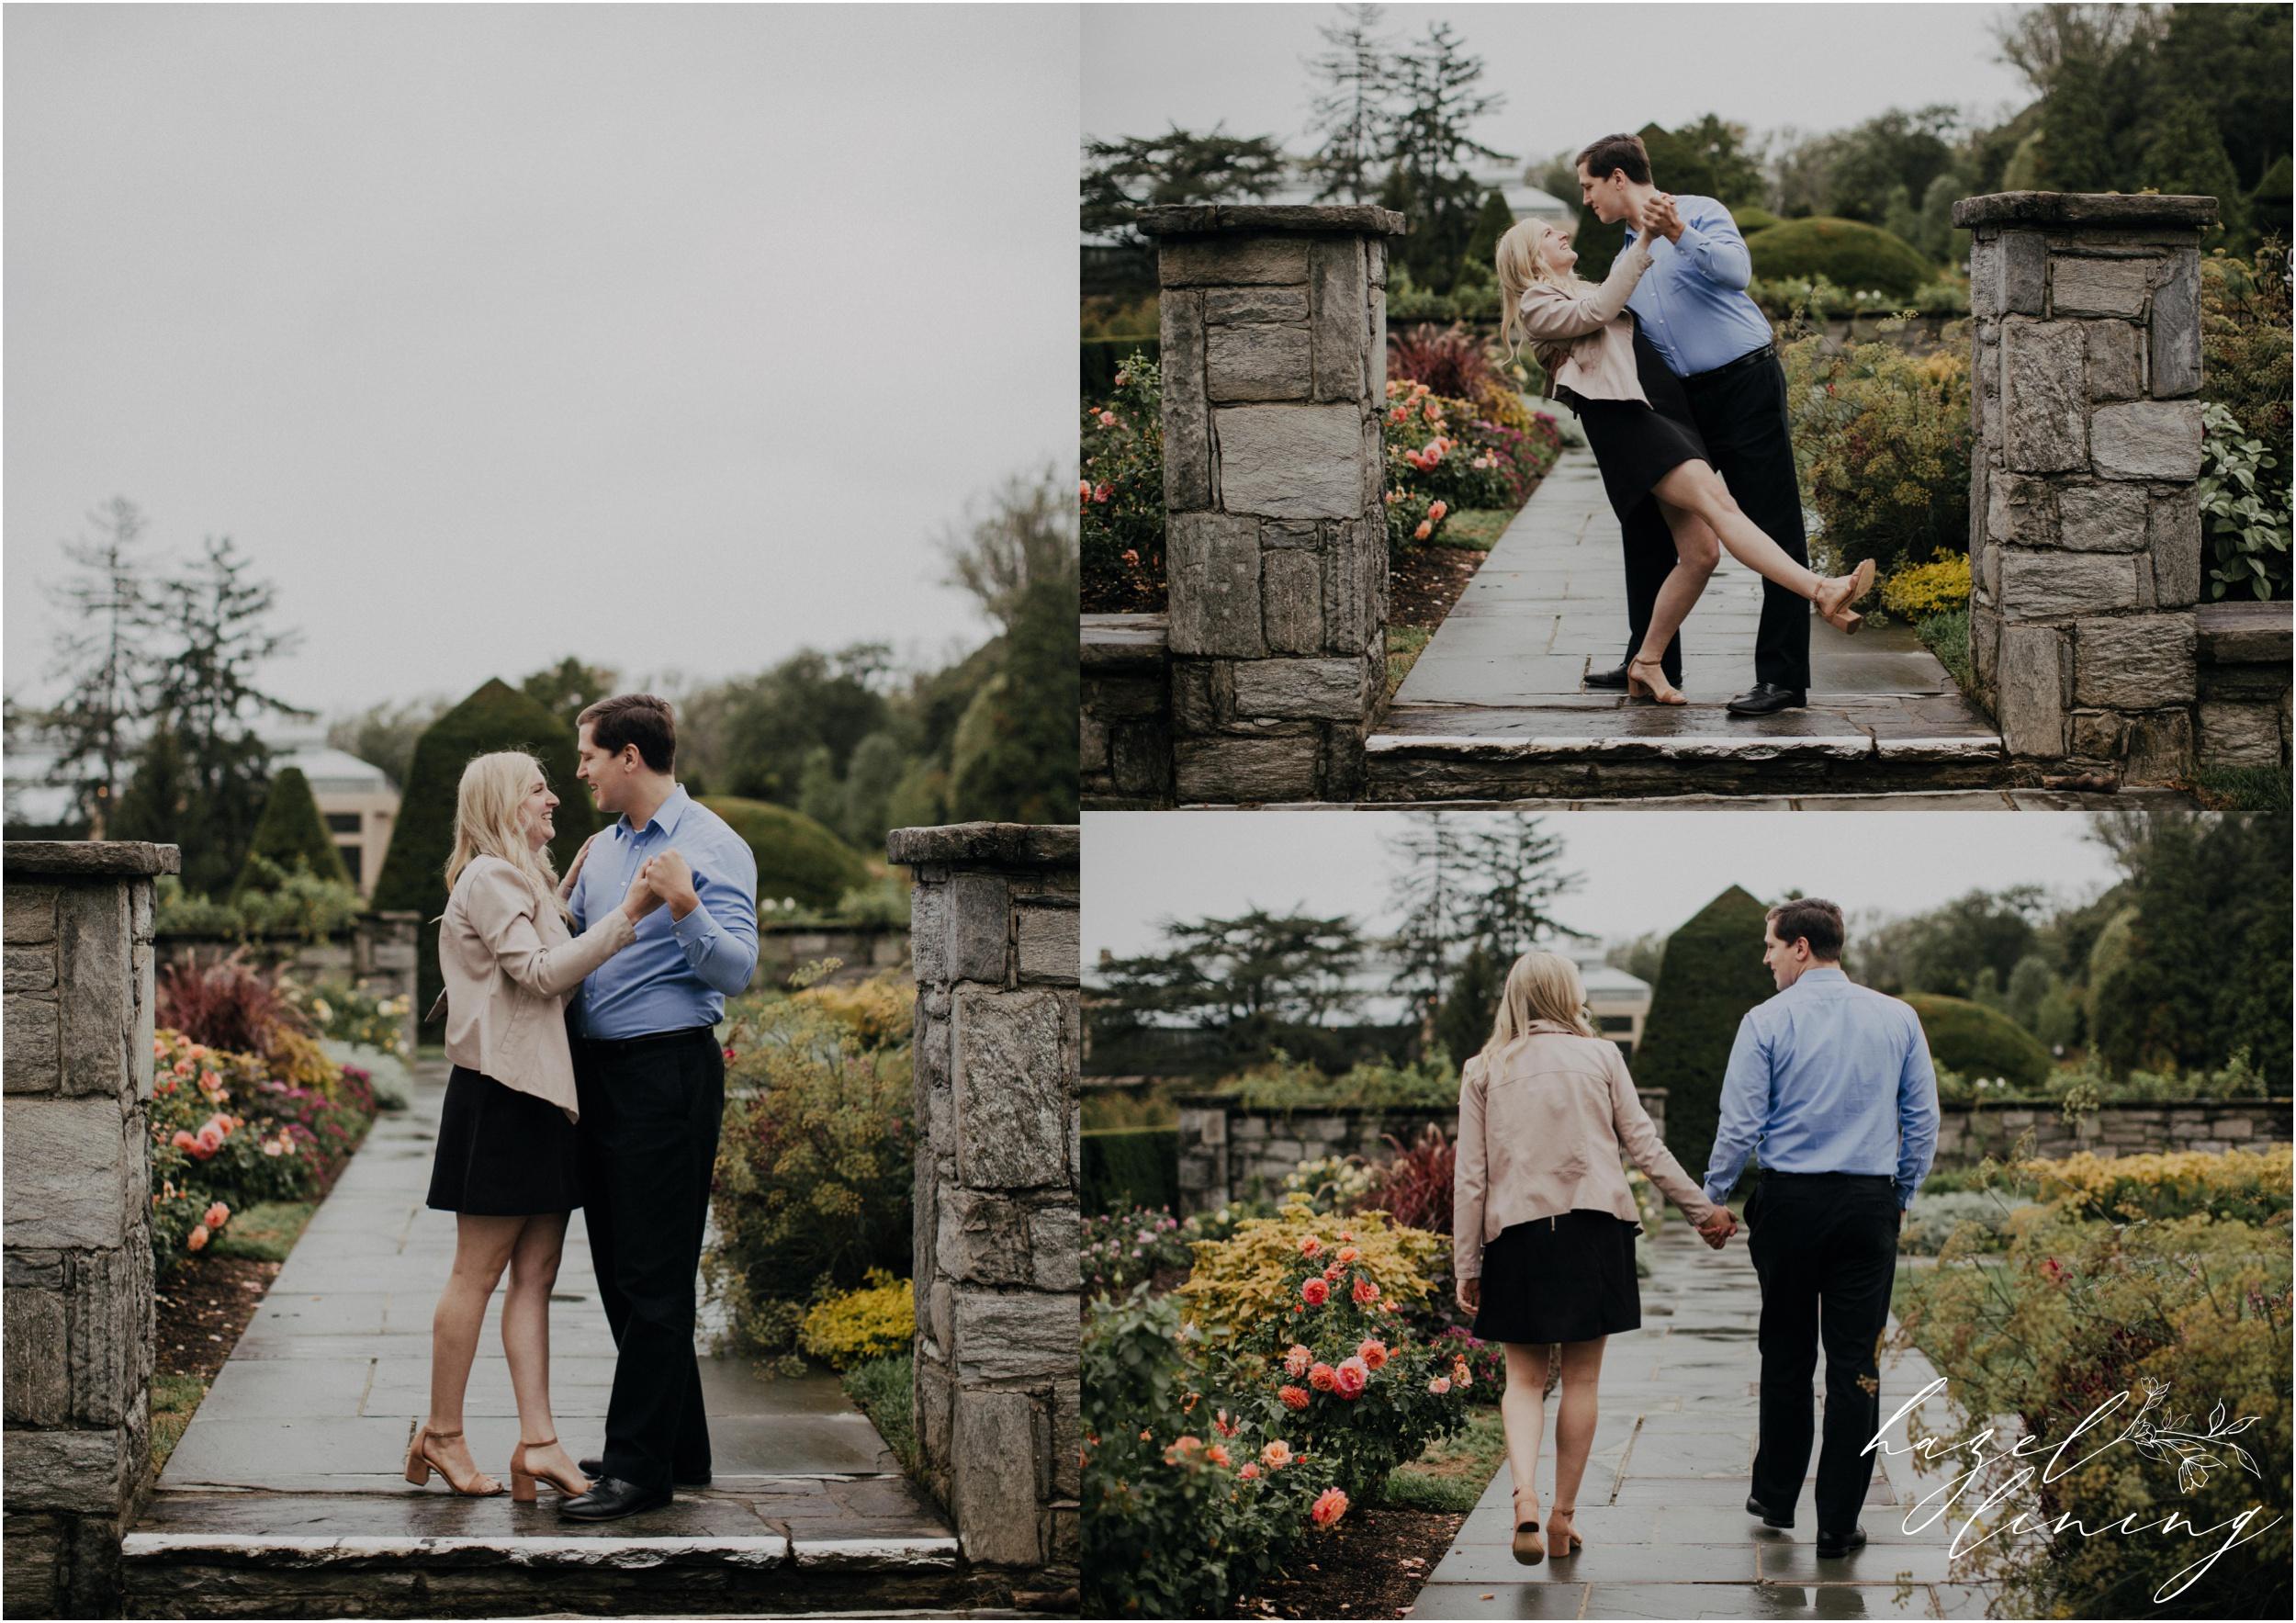 victoria-travis-logan-mayes-longwood-gardens-kennett-square-philadelphia-engagement-session-hazel-lining-photography-destination-elopement-wedding-engagement-photography_0005.jpg